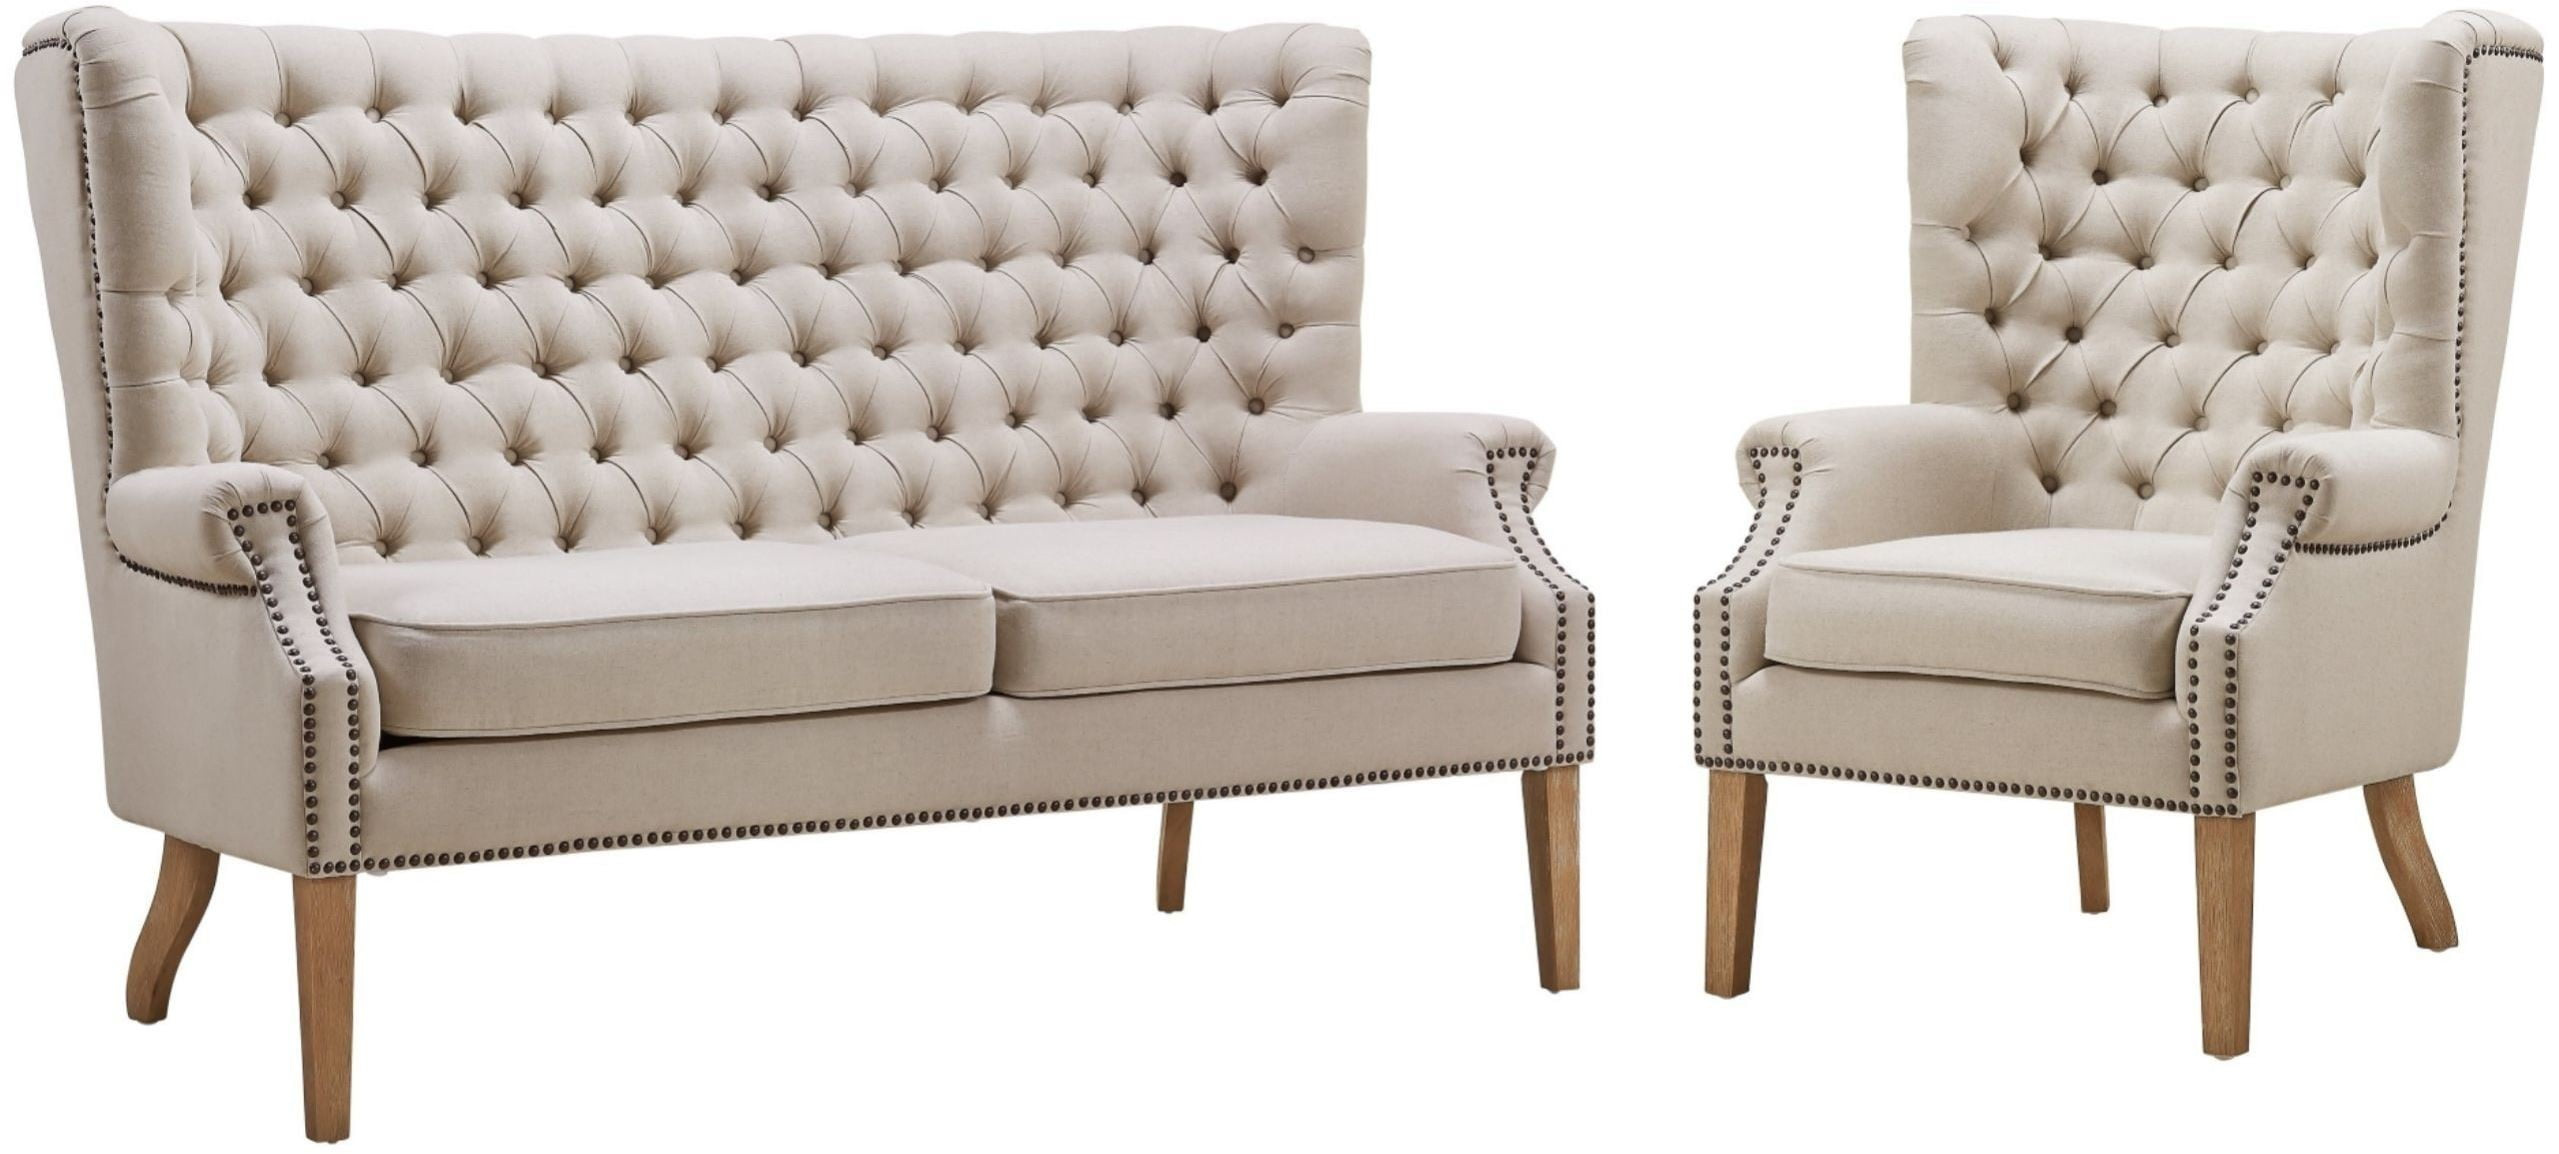 Abe Beige Linen Living Room Set From Tov S2064 Coleman